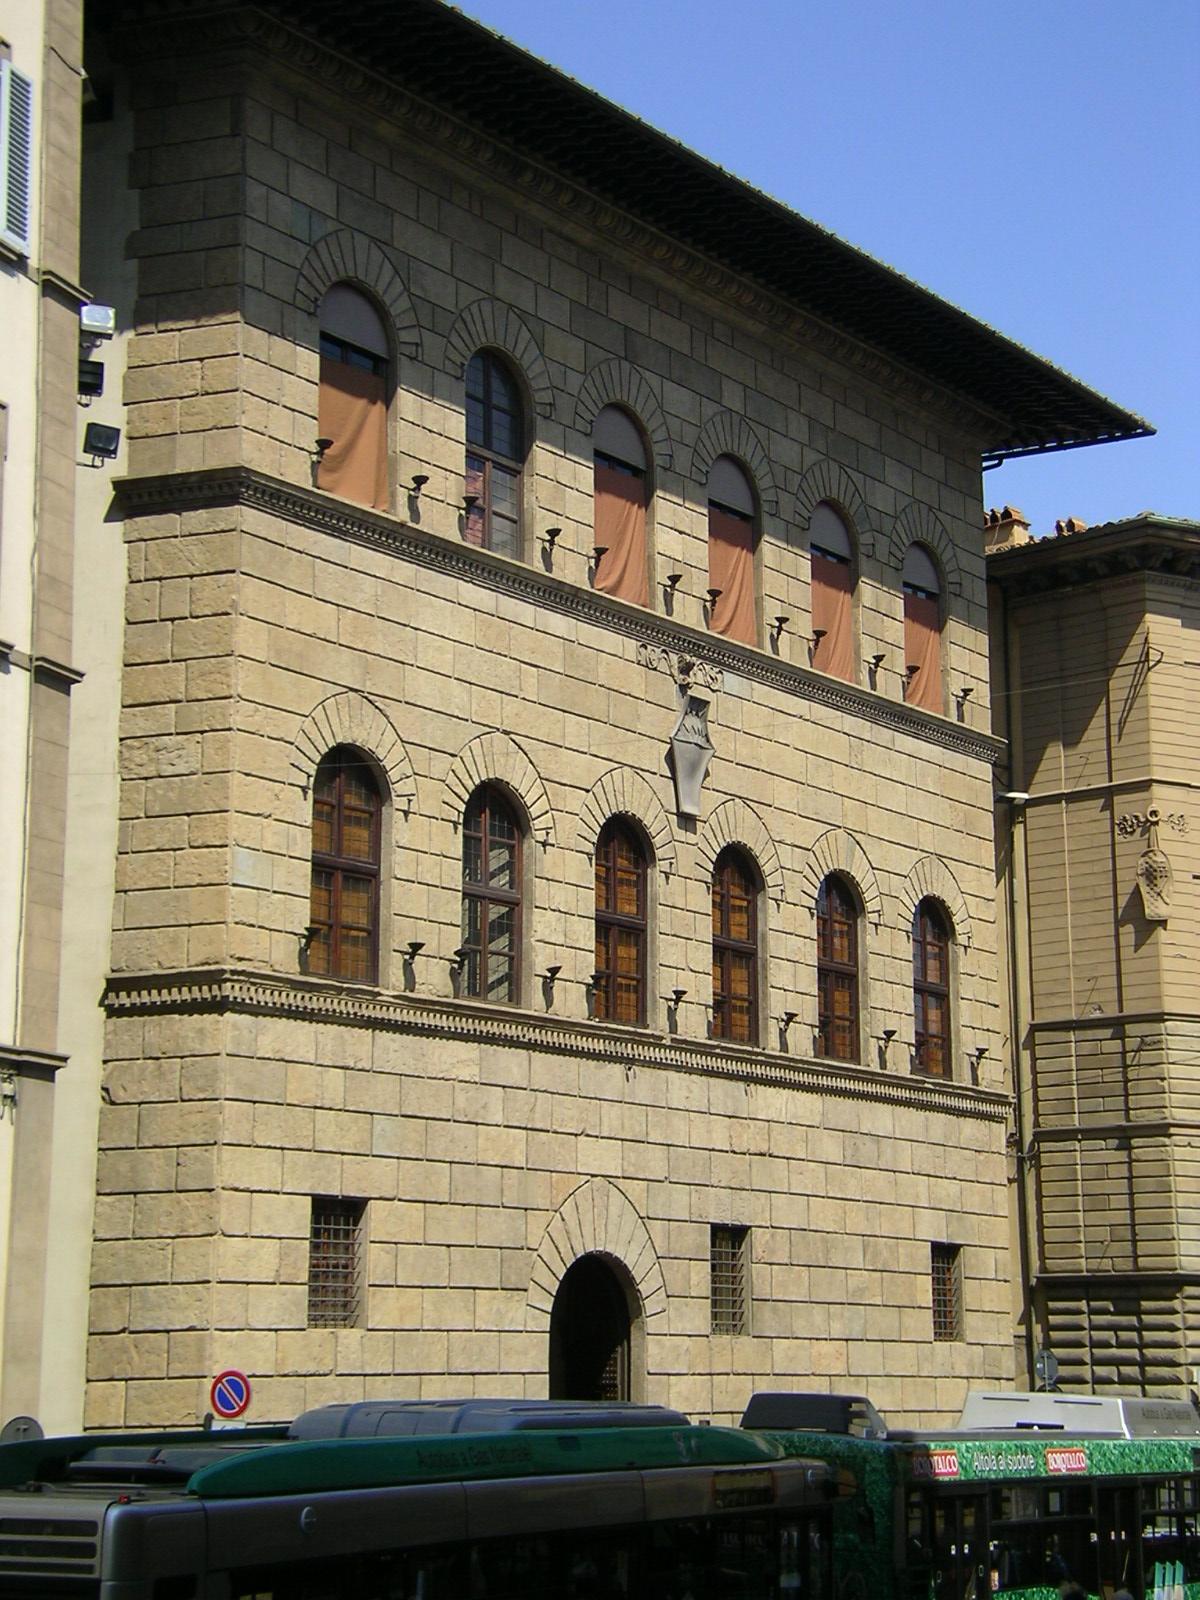 Palazzo antinori wikipedia - I giardini di palazzo rucellai ...